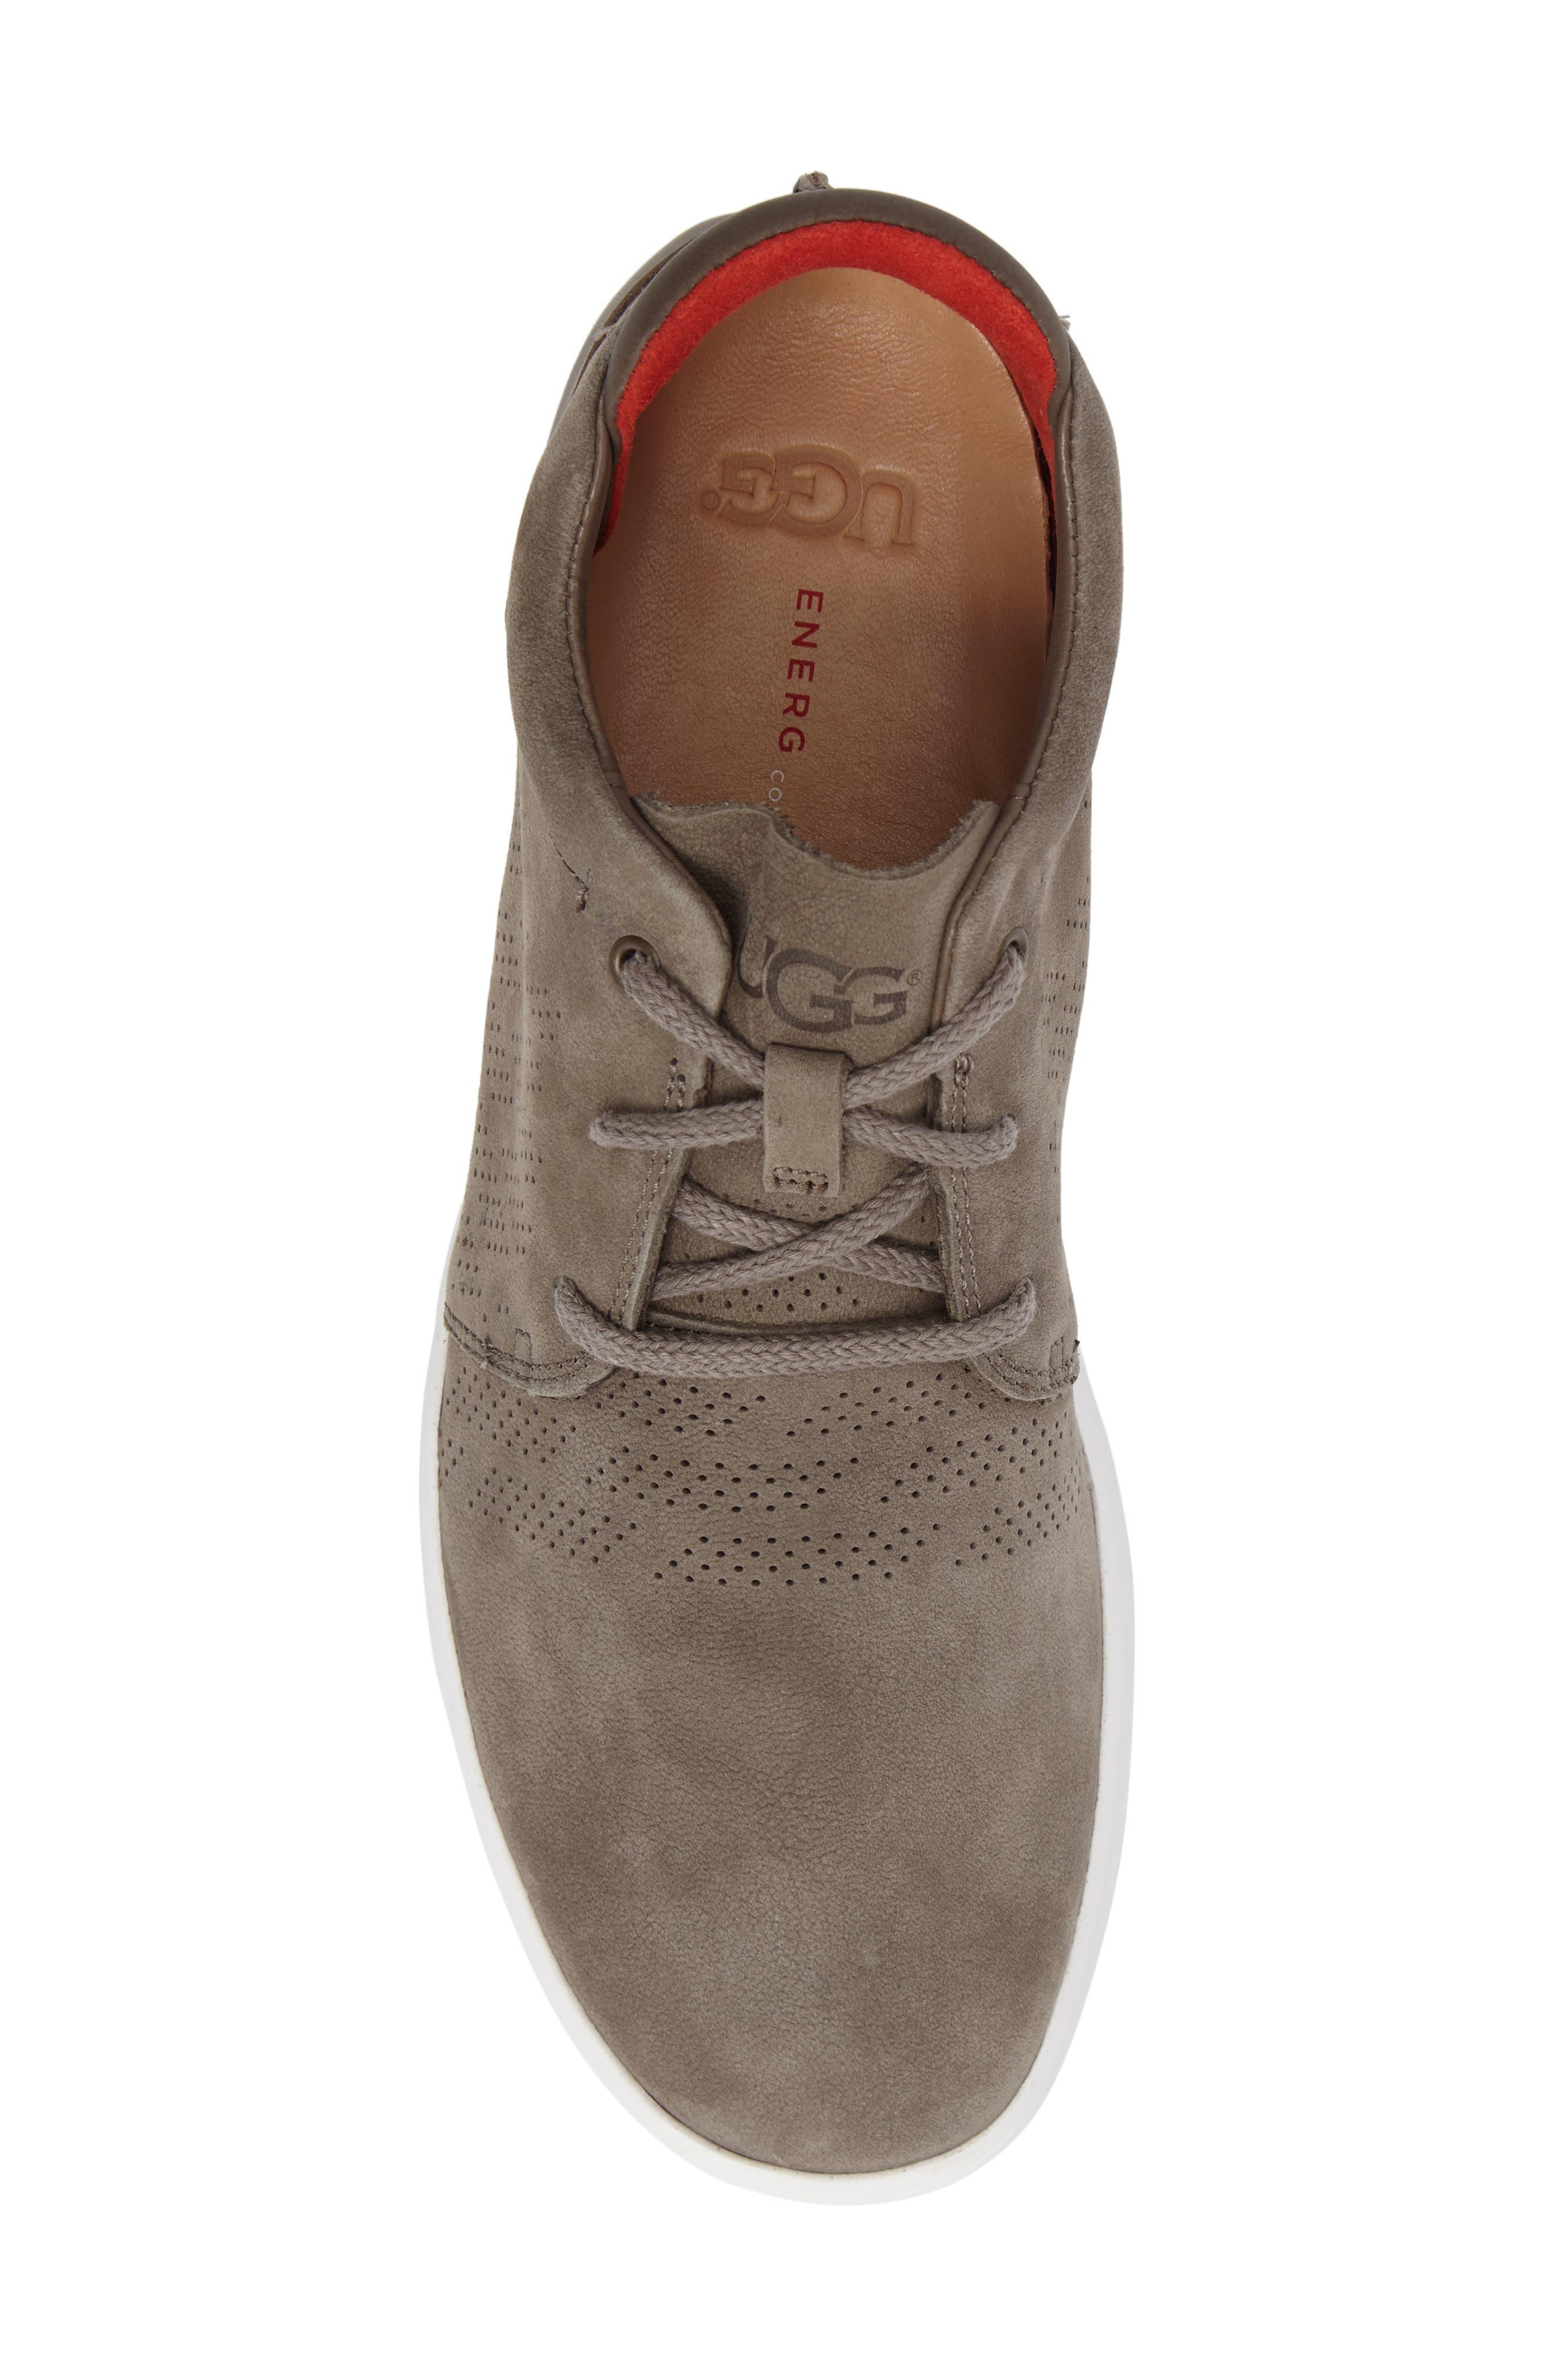 Larken Chukka Sneaker,                             Alternate thumbnail 5, color,                             Mole